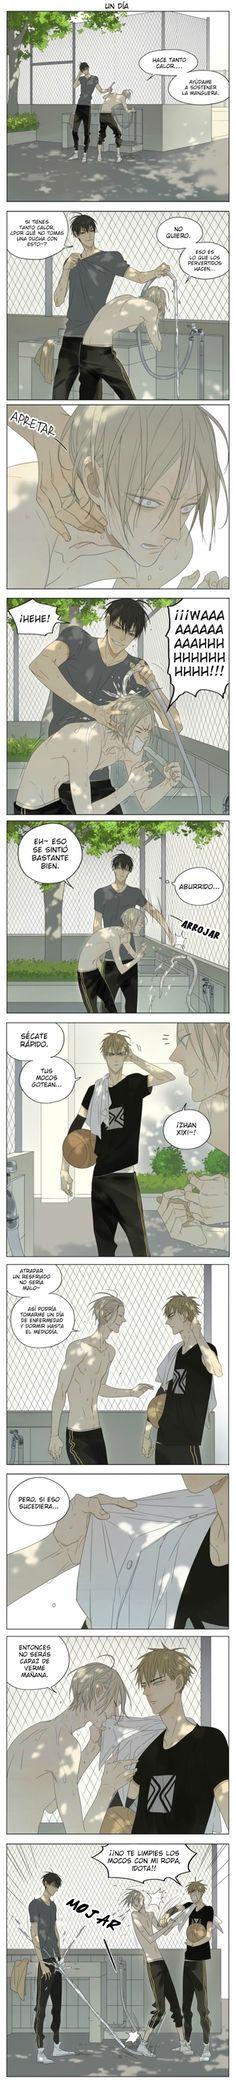 19 Days Capítulo 8 página 2 - Leer Manga en Español gratis en NineManga.com